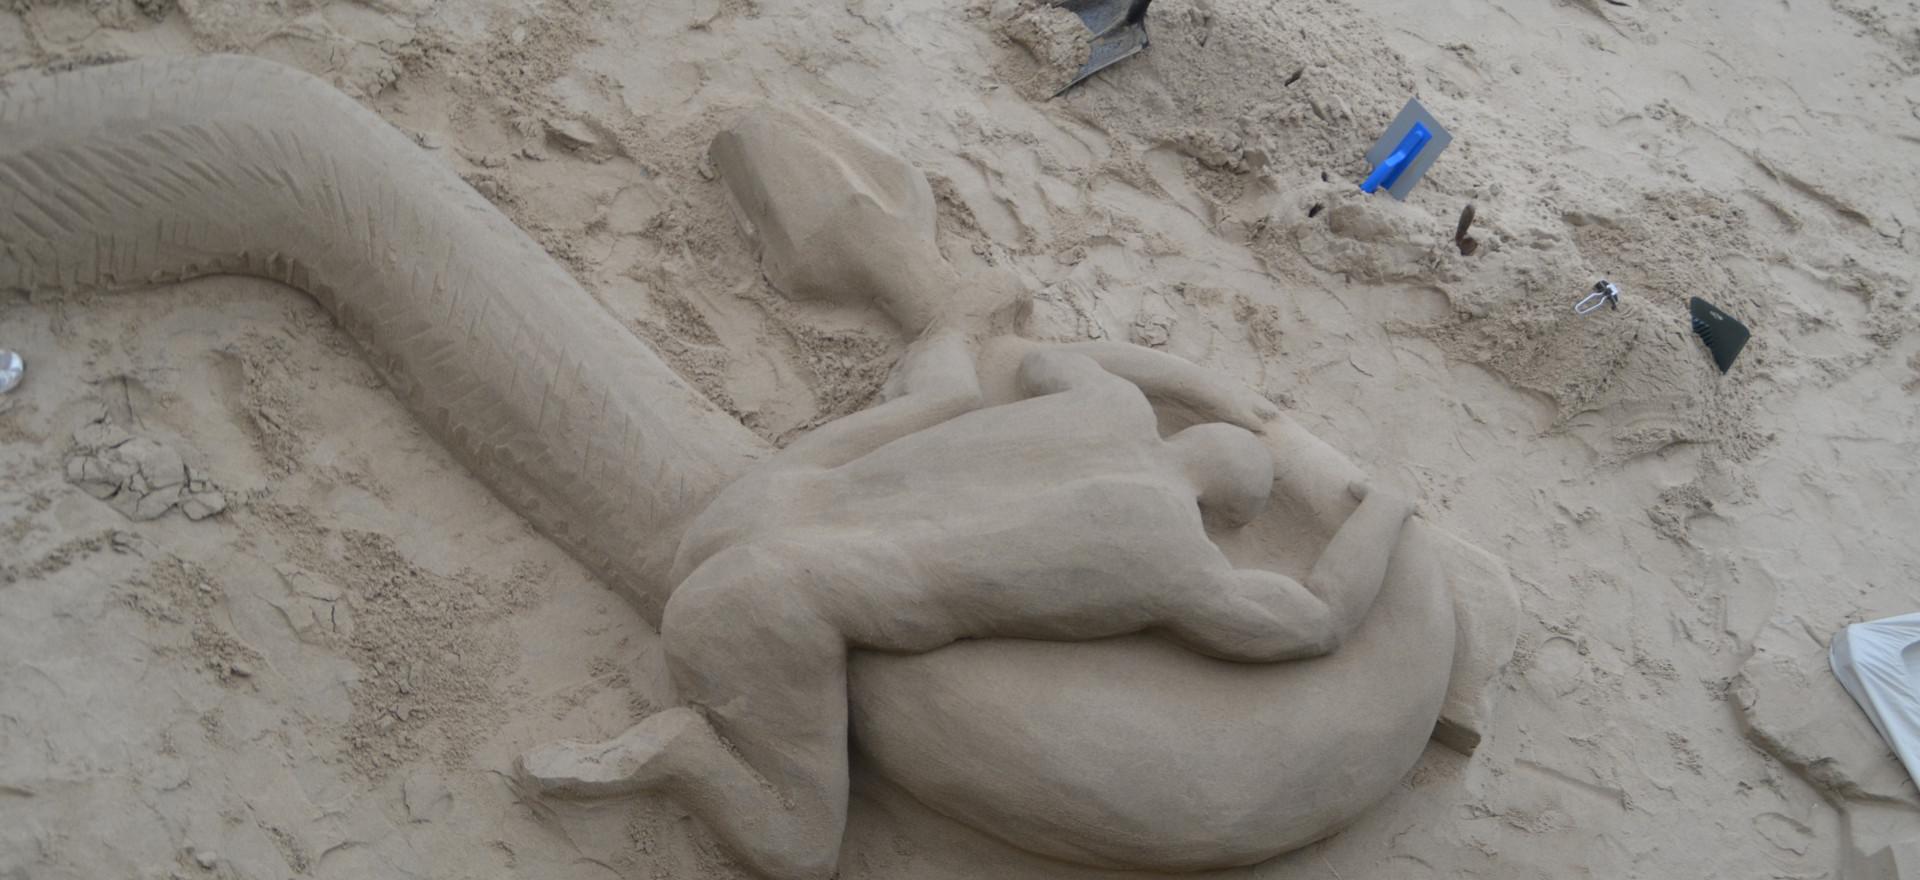 Sea Monster in London